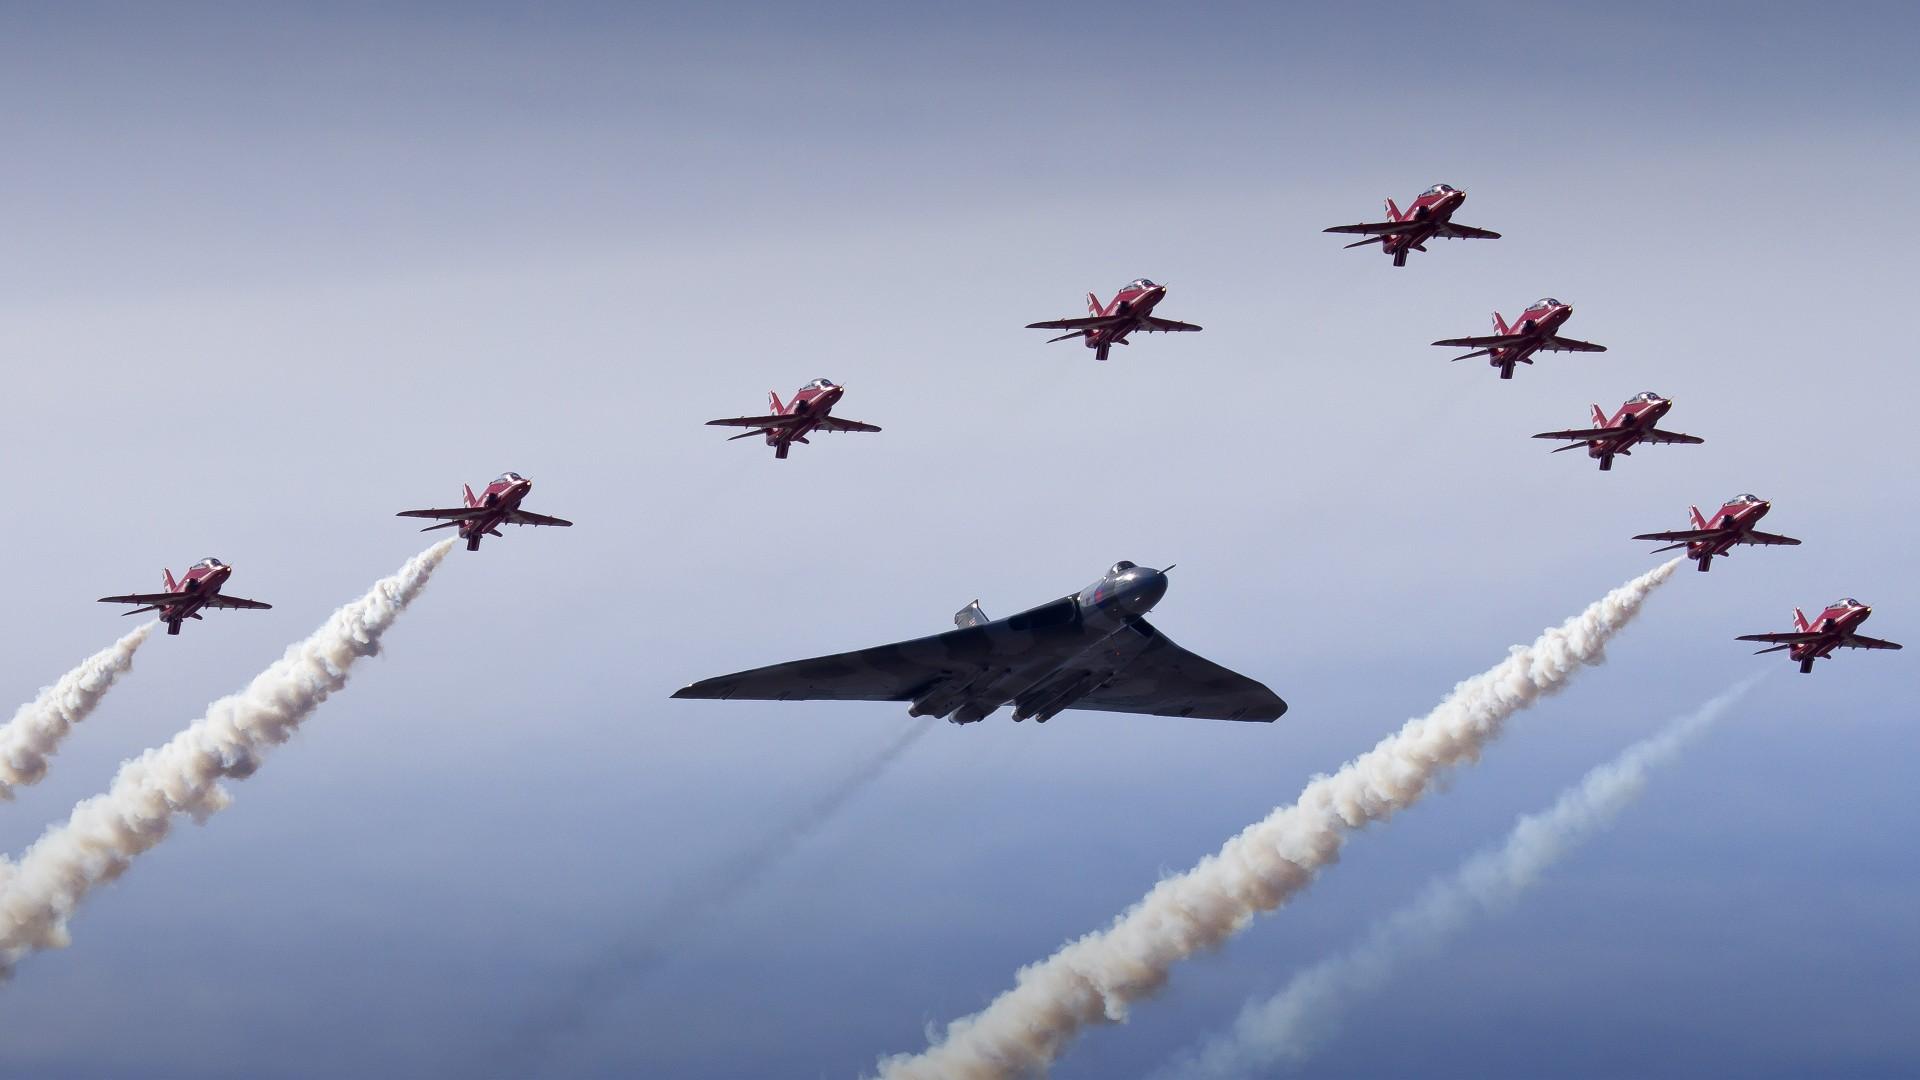 Vulcan Bomber Red Arrows 4K Wallpapers HD Wallpapers